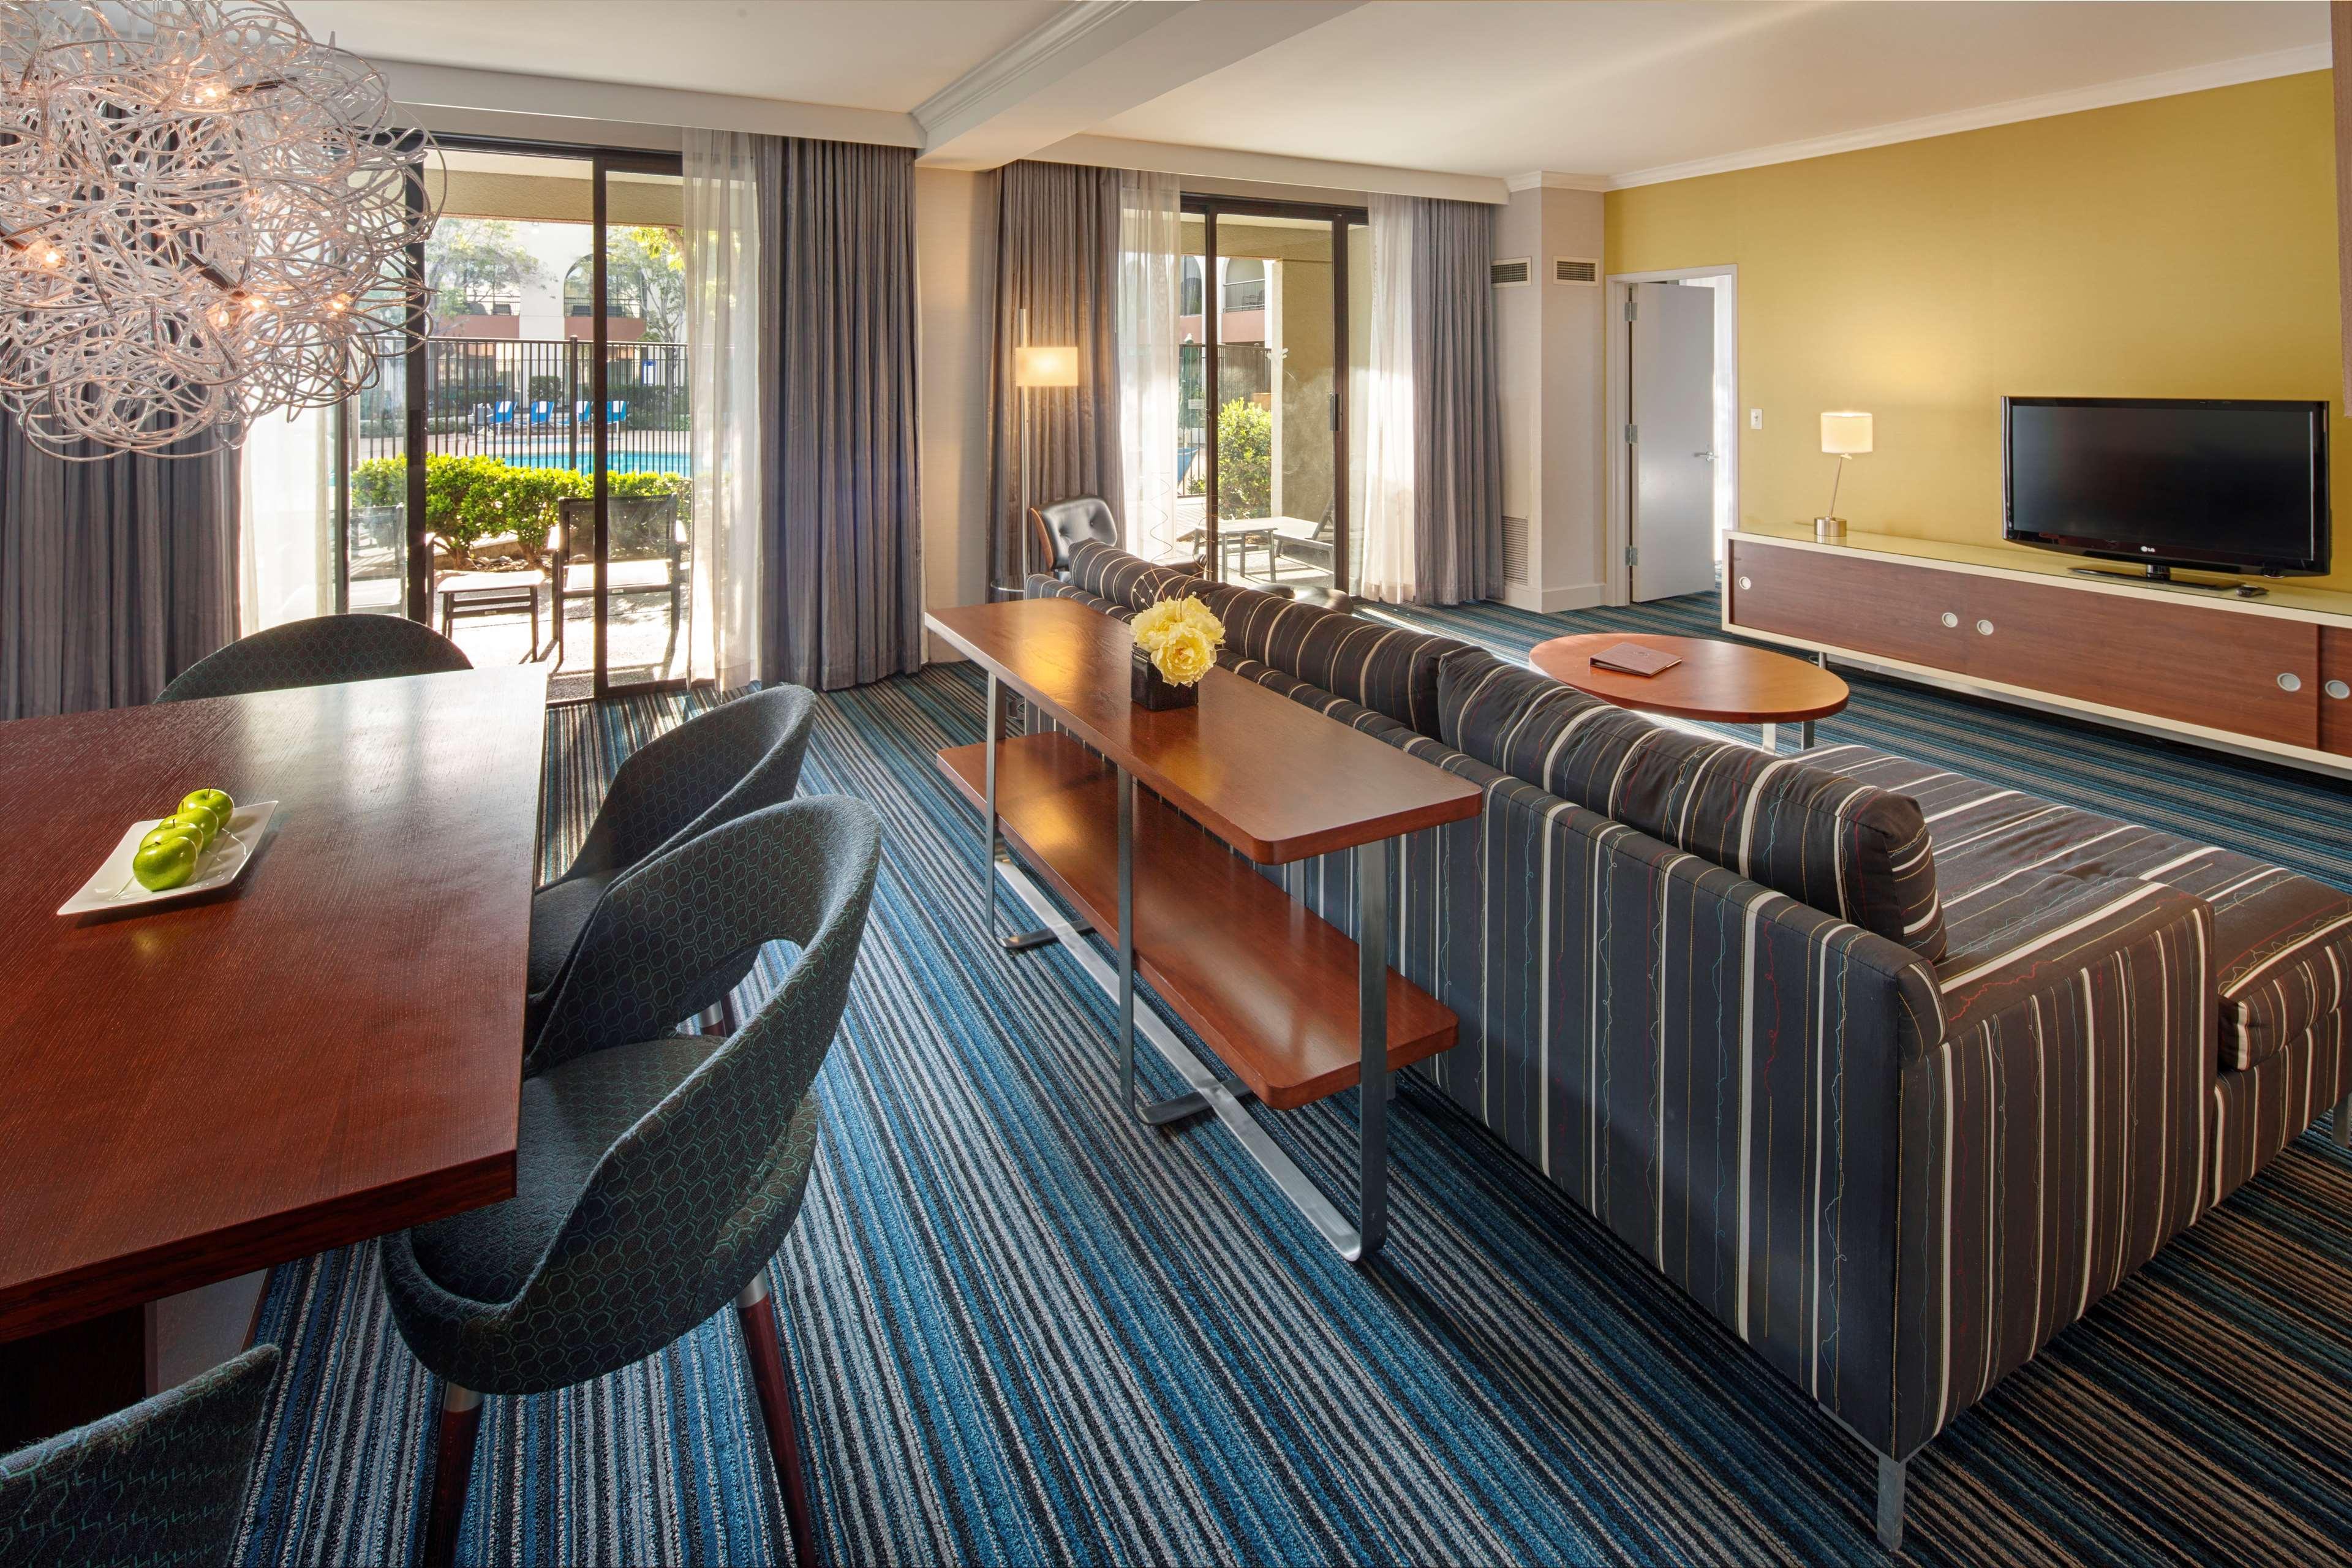 DoubleTree by Hilton Hotel Newark - Fremont image 32